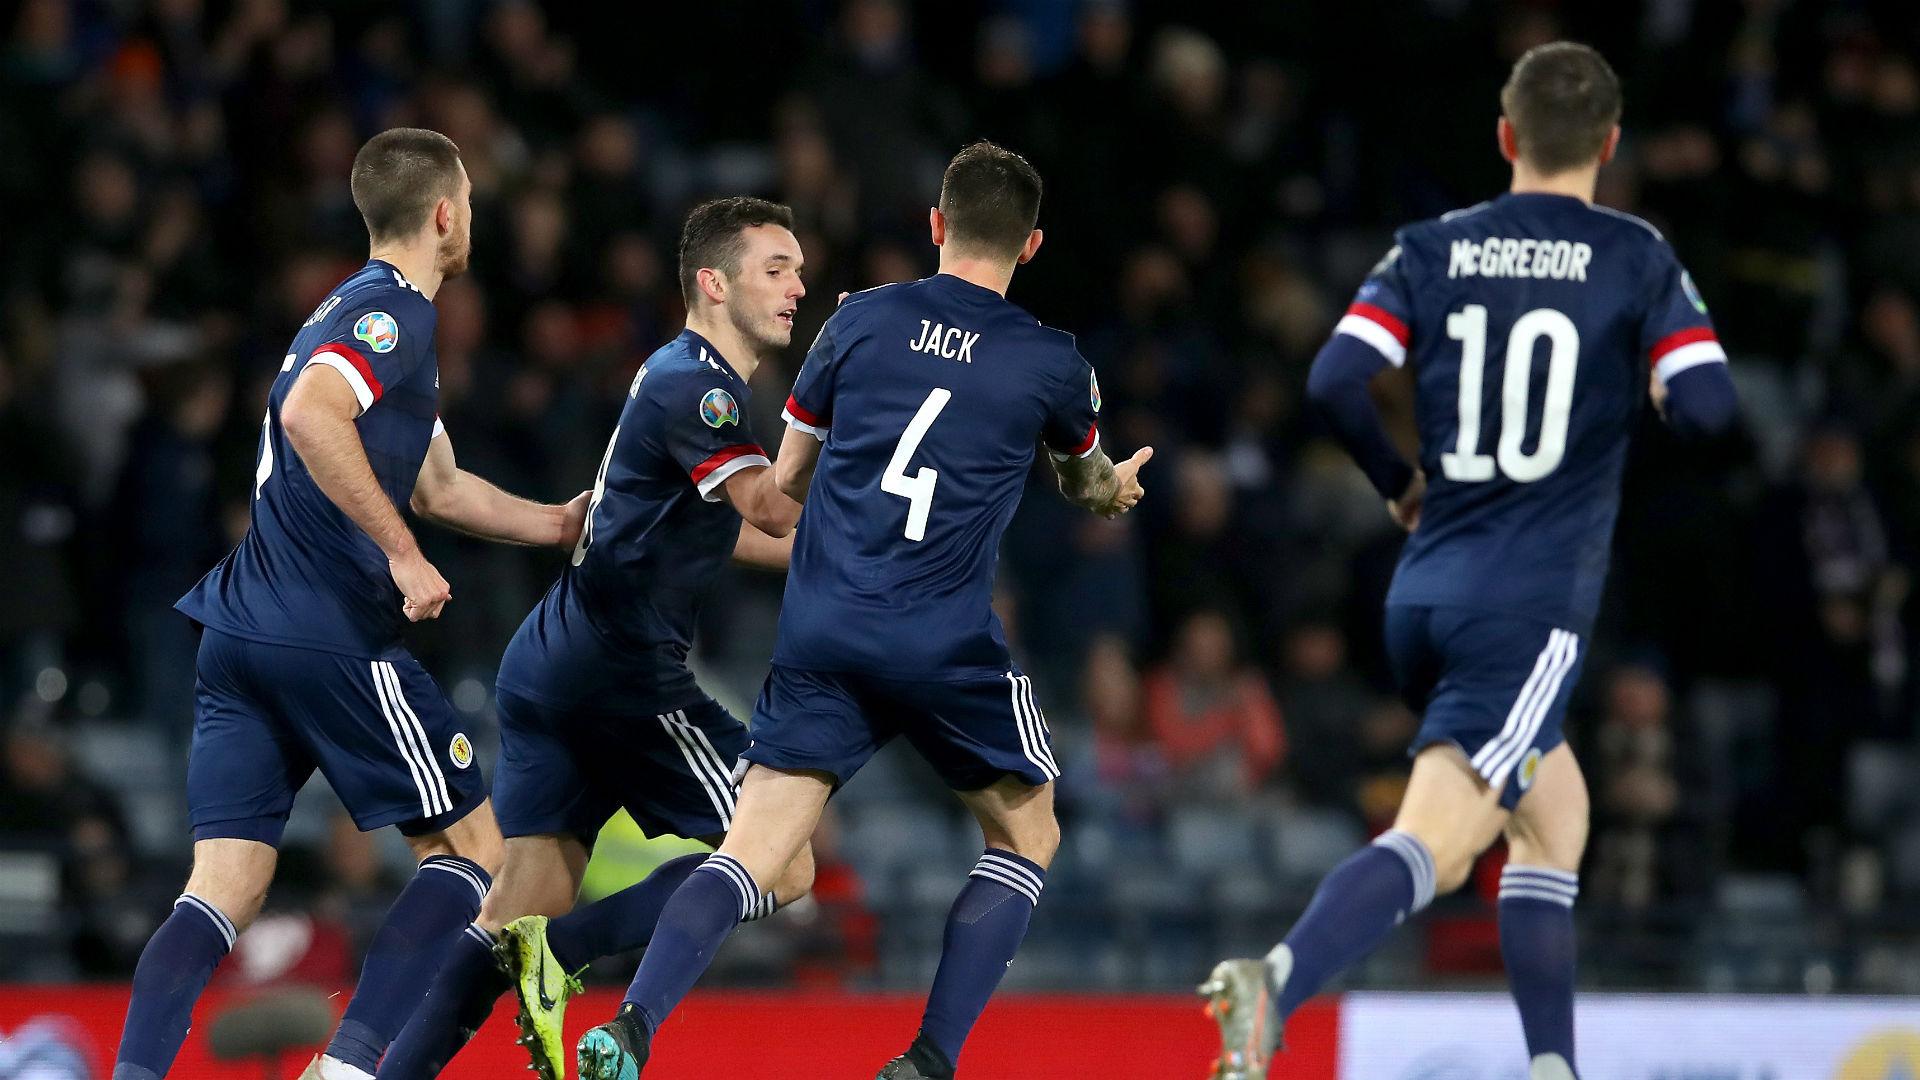 Scotland 3-1 Kazakhstan: McGinn at the double in comeback win